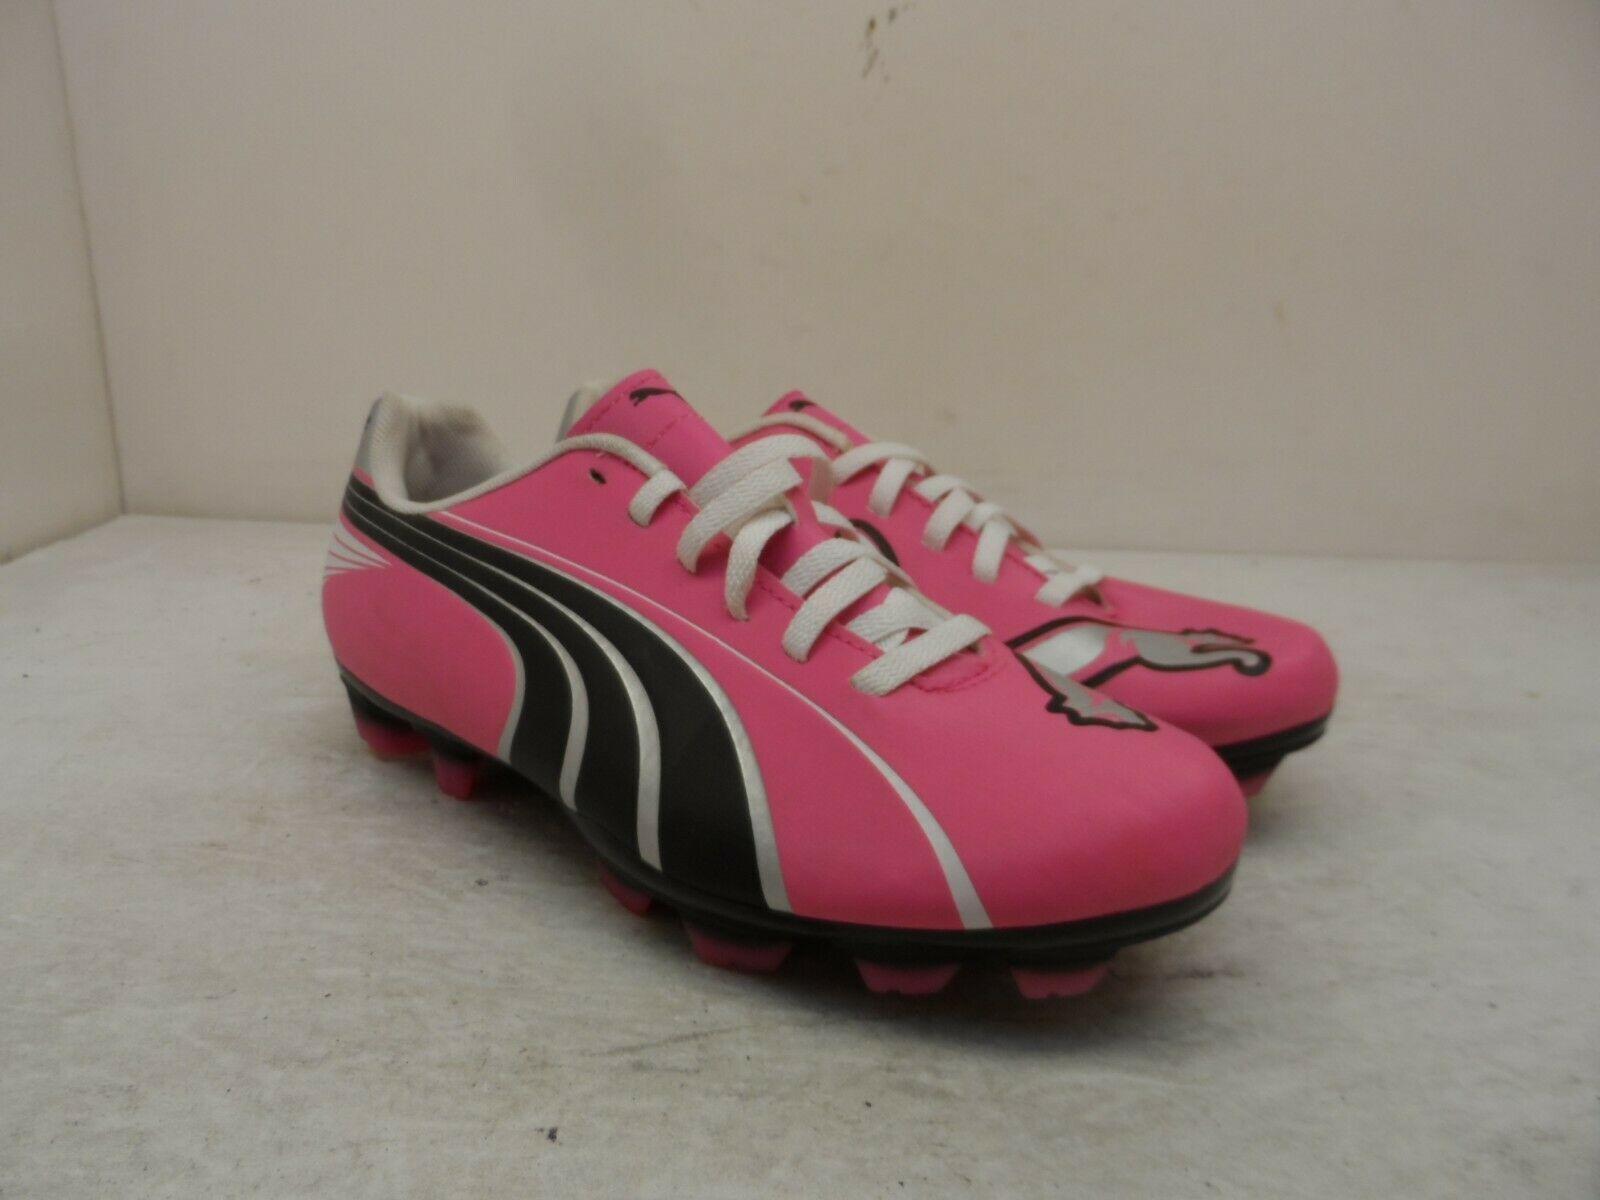 Puma Girl's Low Attencio II FG Jr Soccer Cleats Pink/Blue/Silver Size 3Y - $23.74